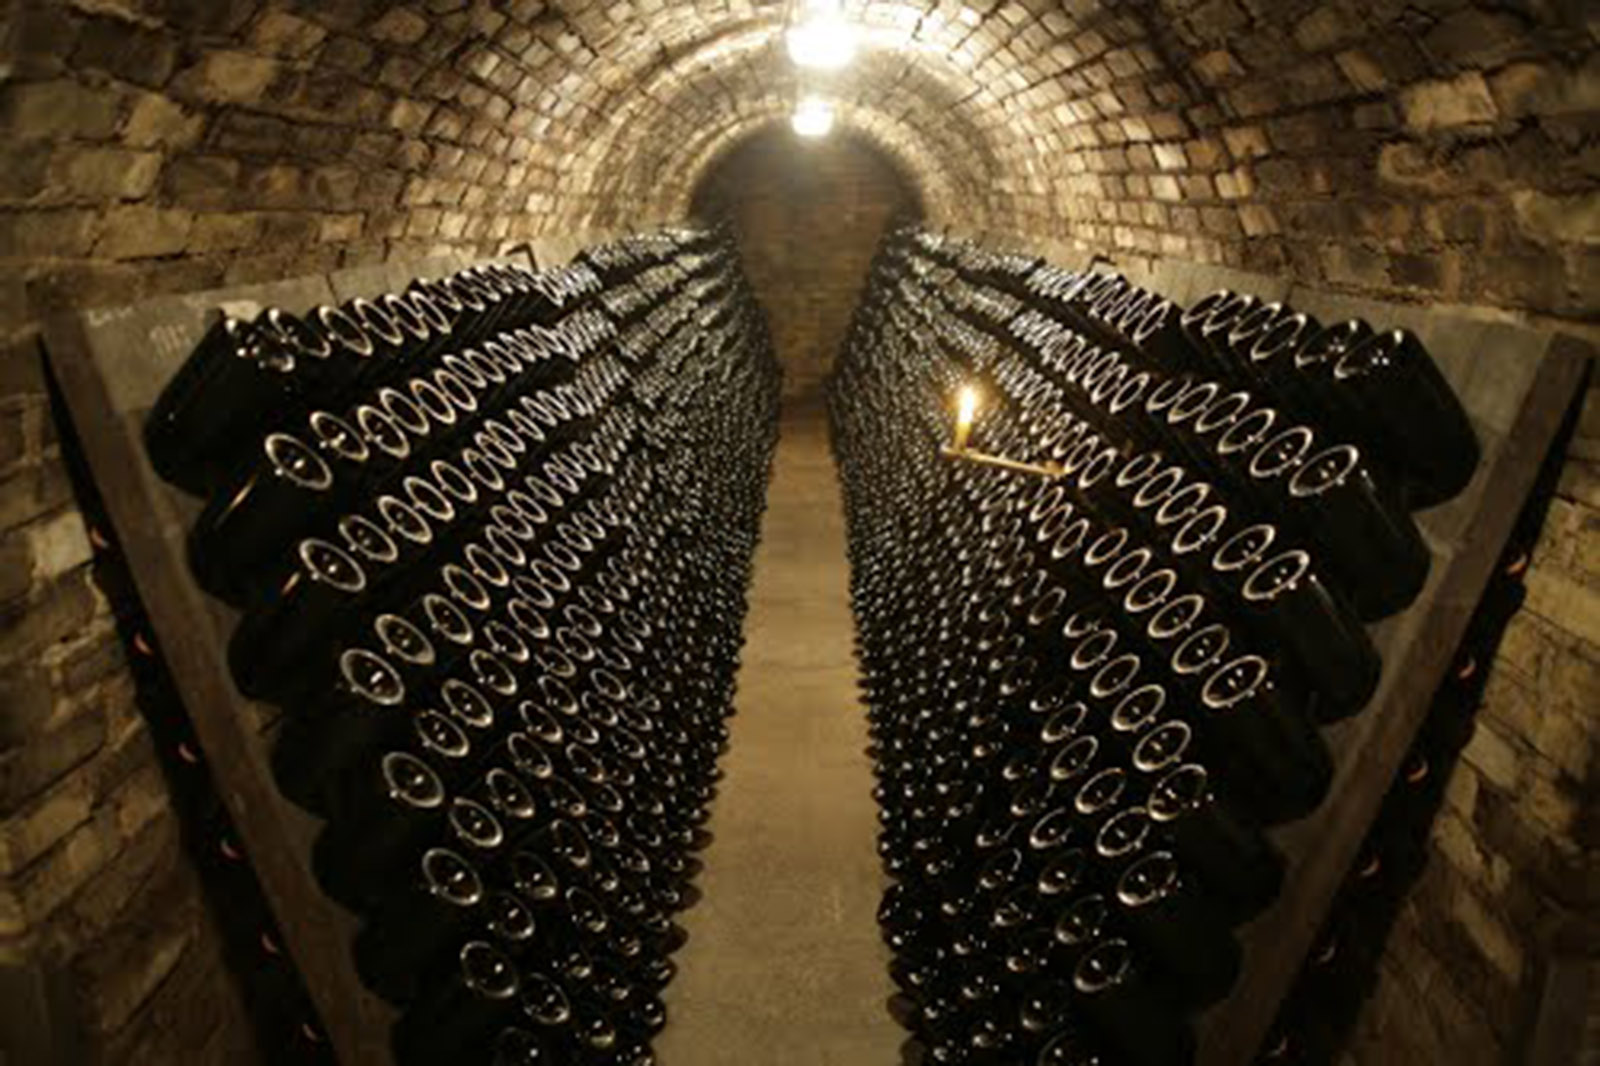 Bodega de Champagne